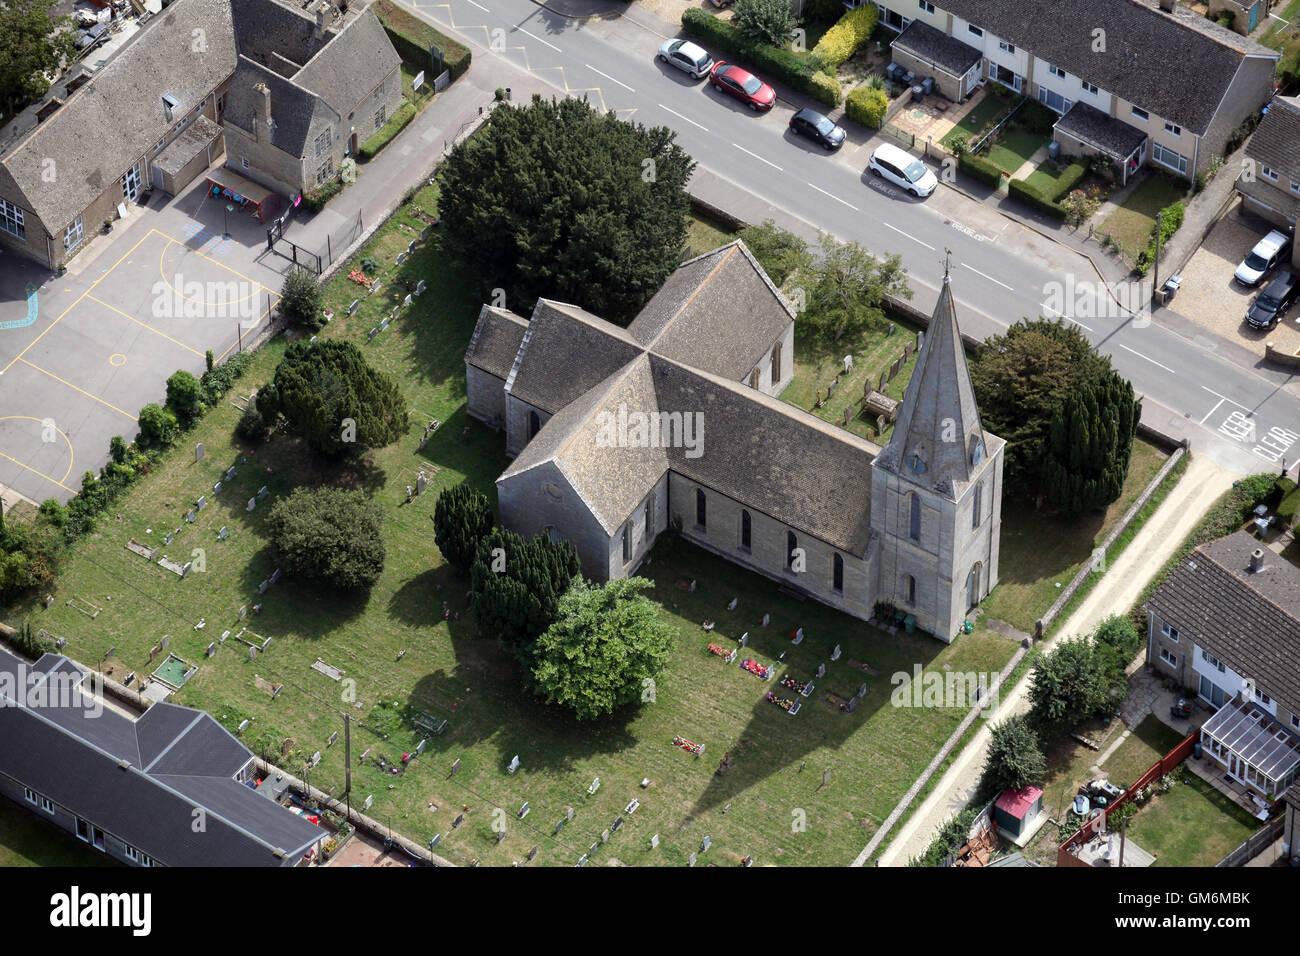 aerial view of St James Church at Aston near Bampton, Oxfordshire, UK - Stock Image